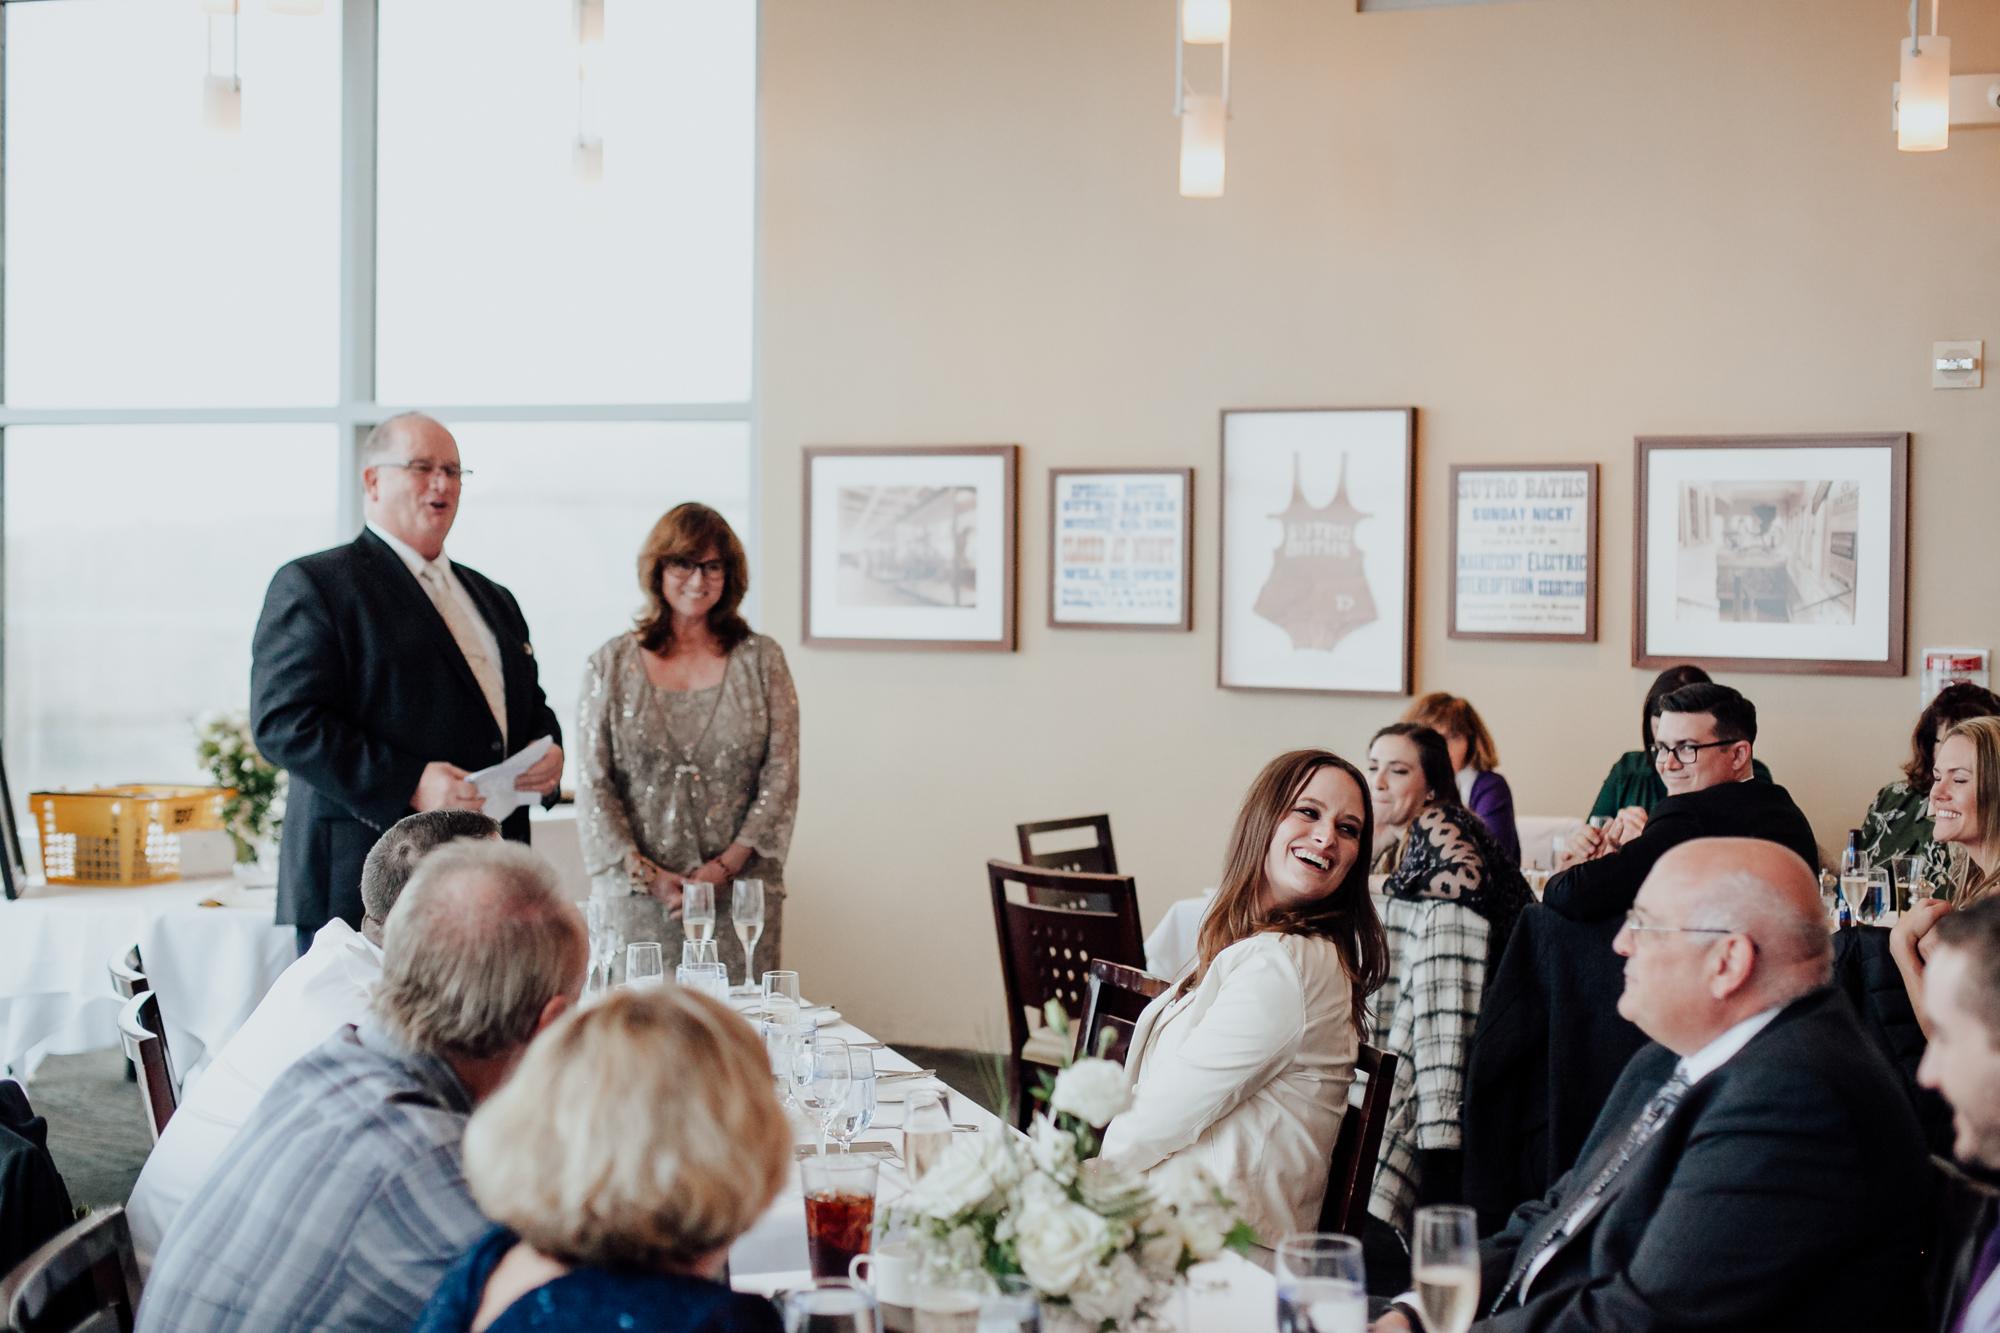 san-francisco-city-hall-wedding-marble-rye-photography-011768.JPG